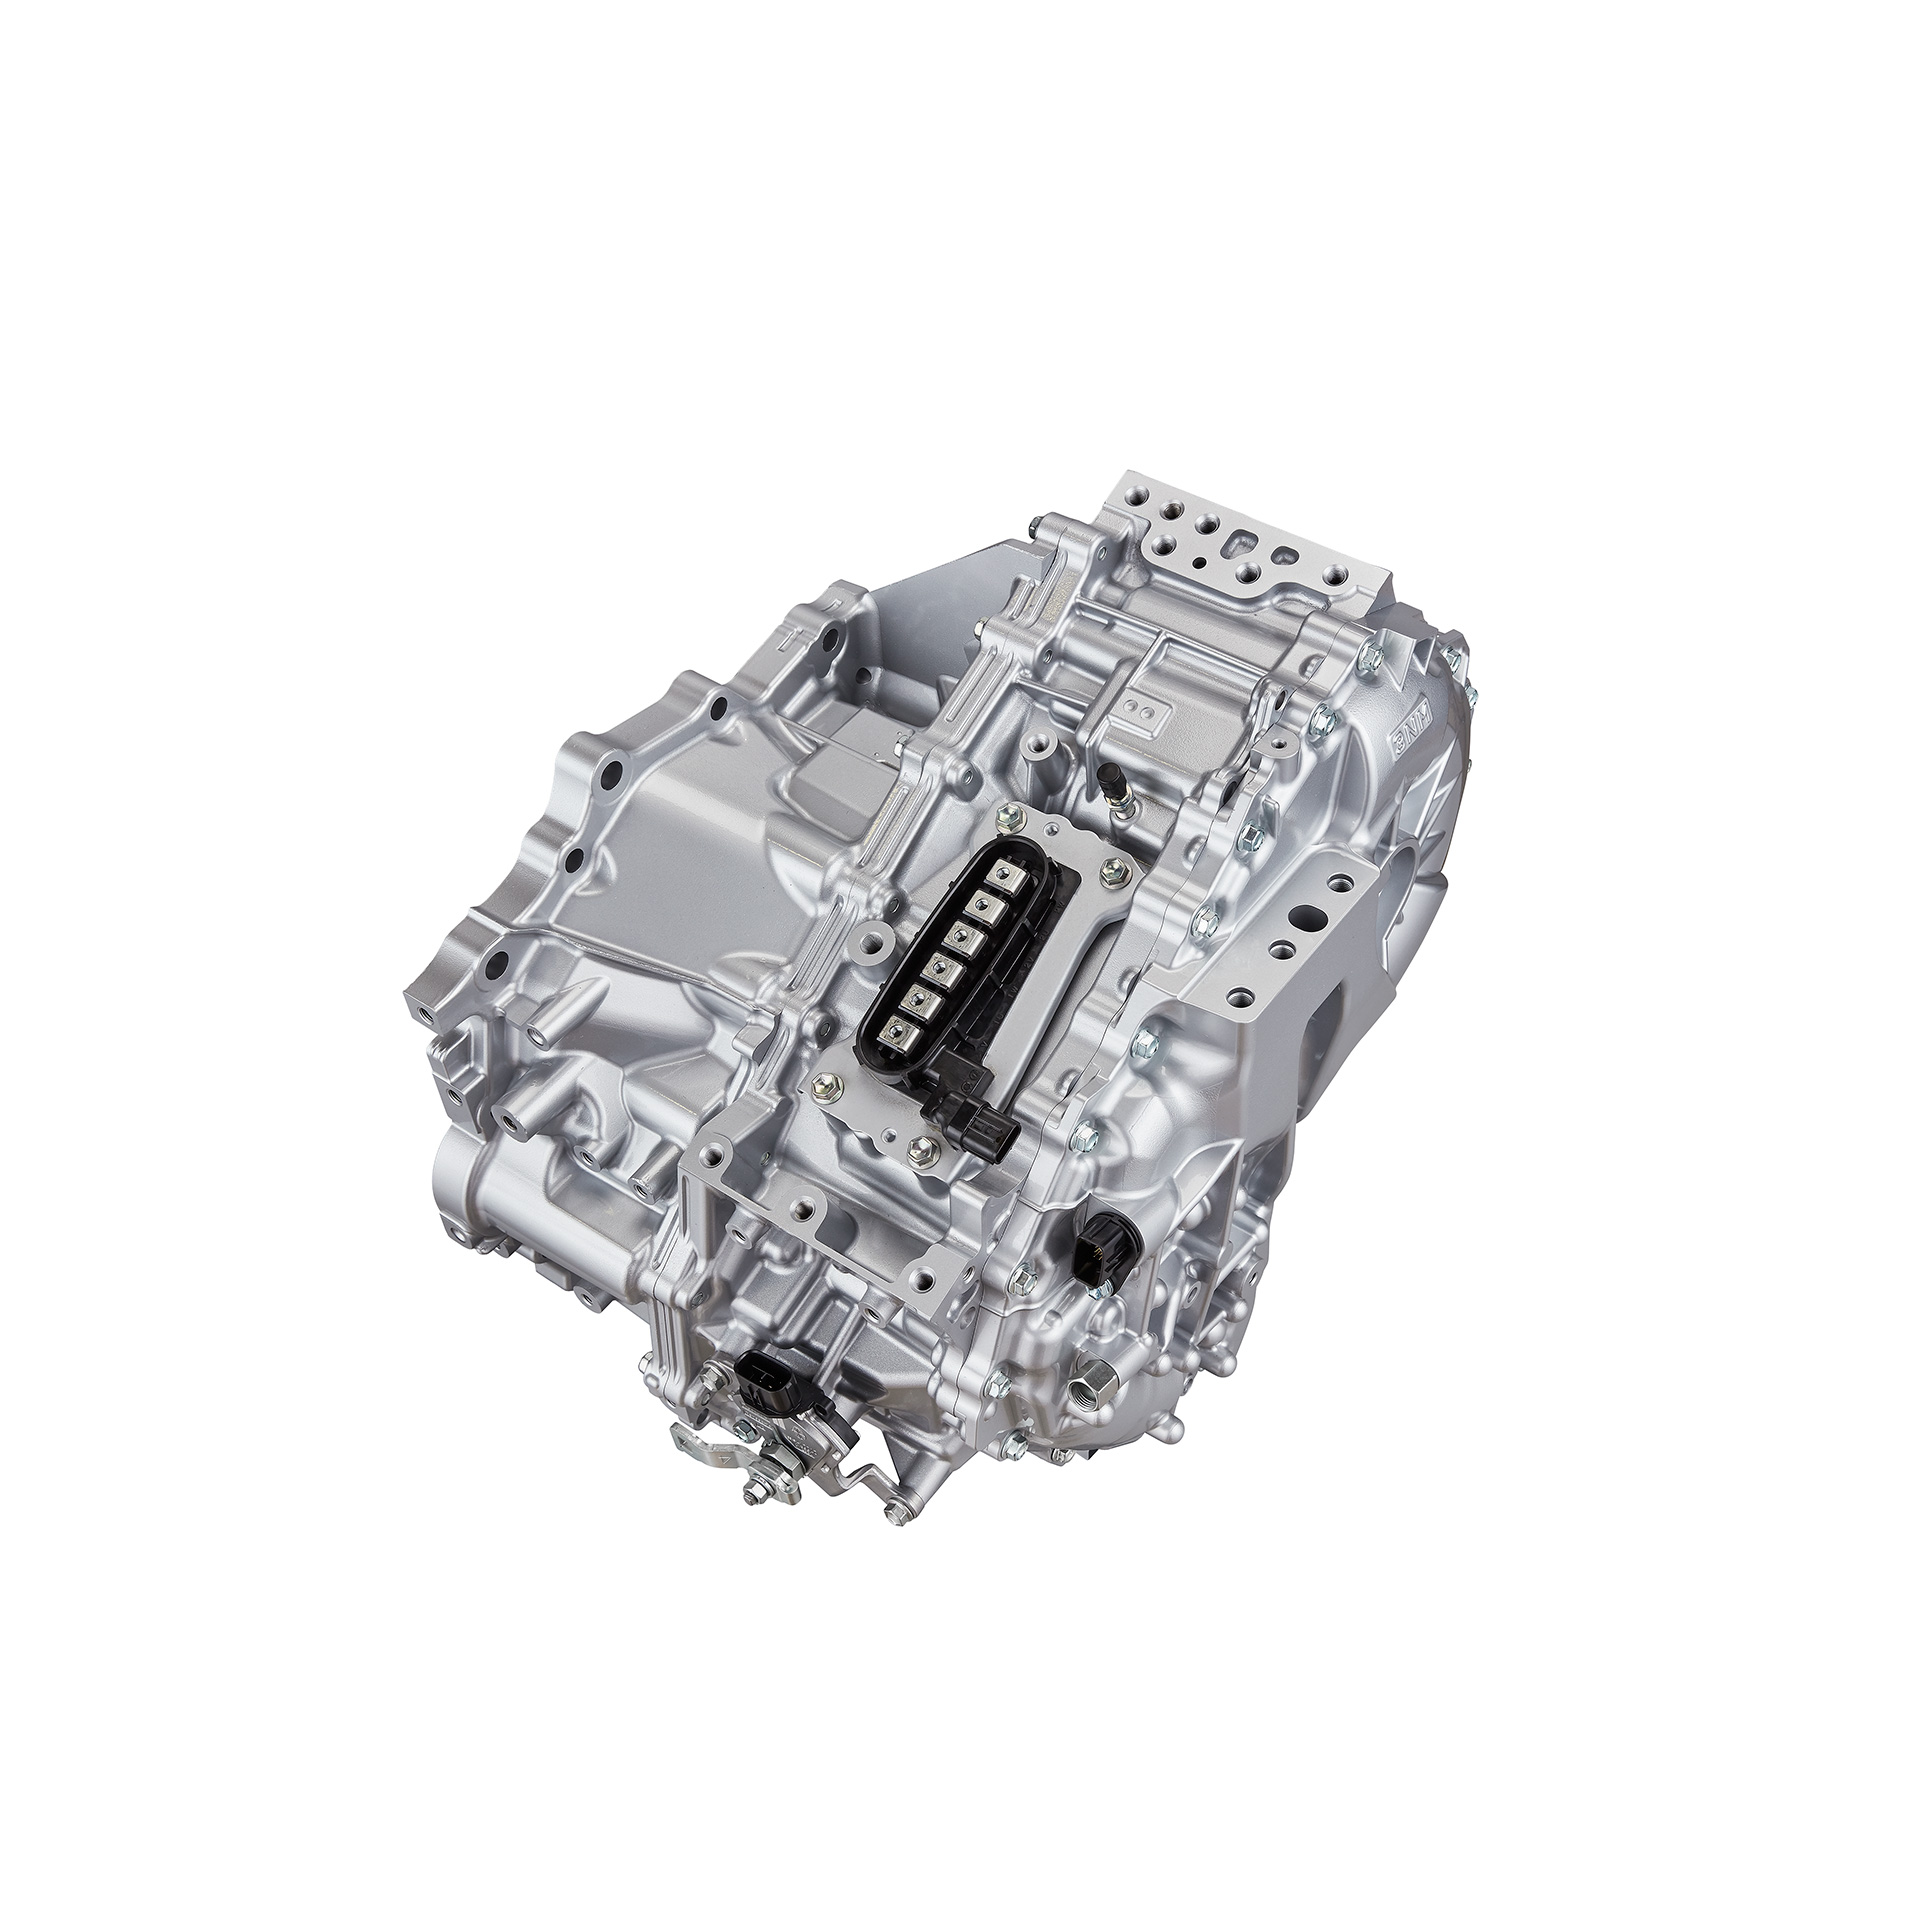 20 Liter Dynamic Force Engine A New Direct Injection Vw 3d Diagram Inline 4 Cylinder Gasoline Toyota Global Newsroom